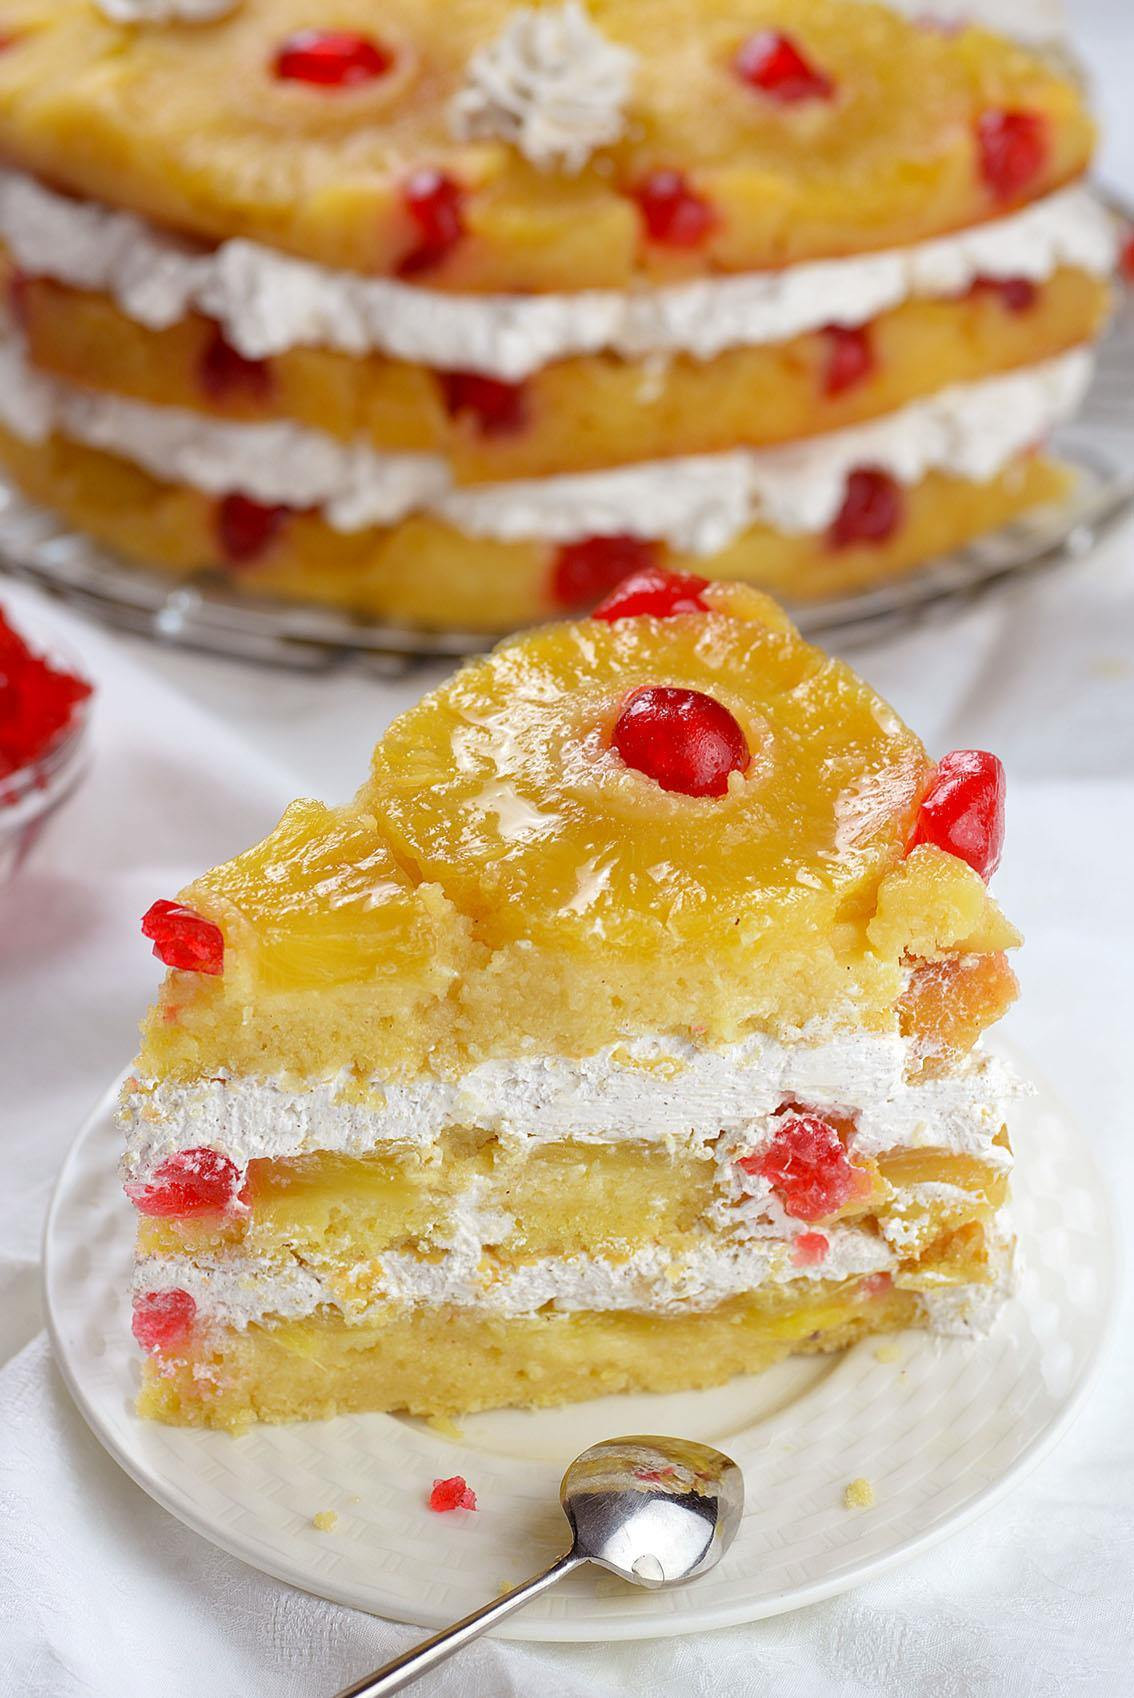 Recipe For Pineapple Upside Down Cake  Pineapple Upside Down Cake